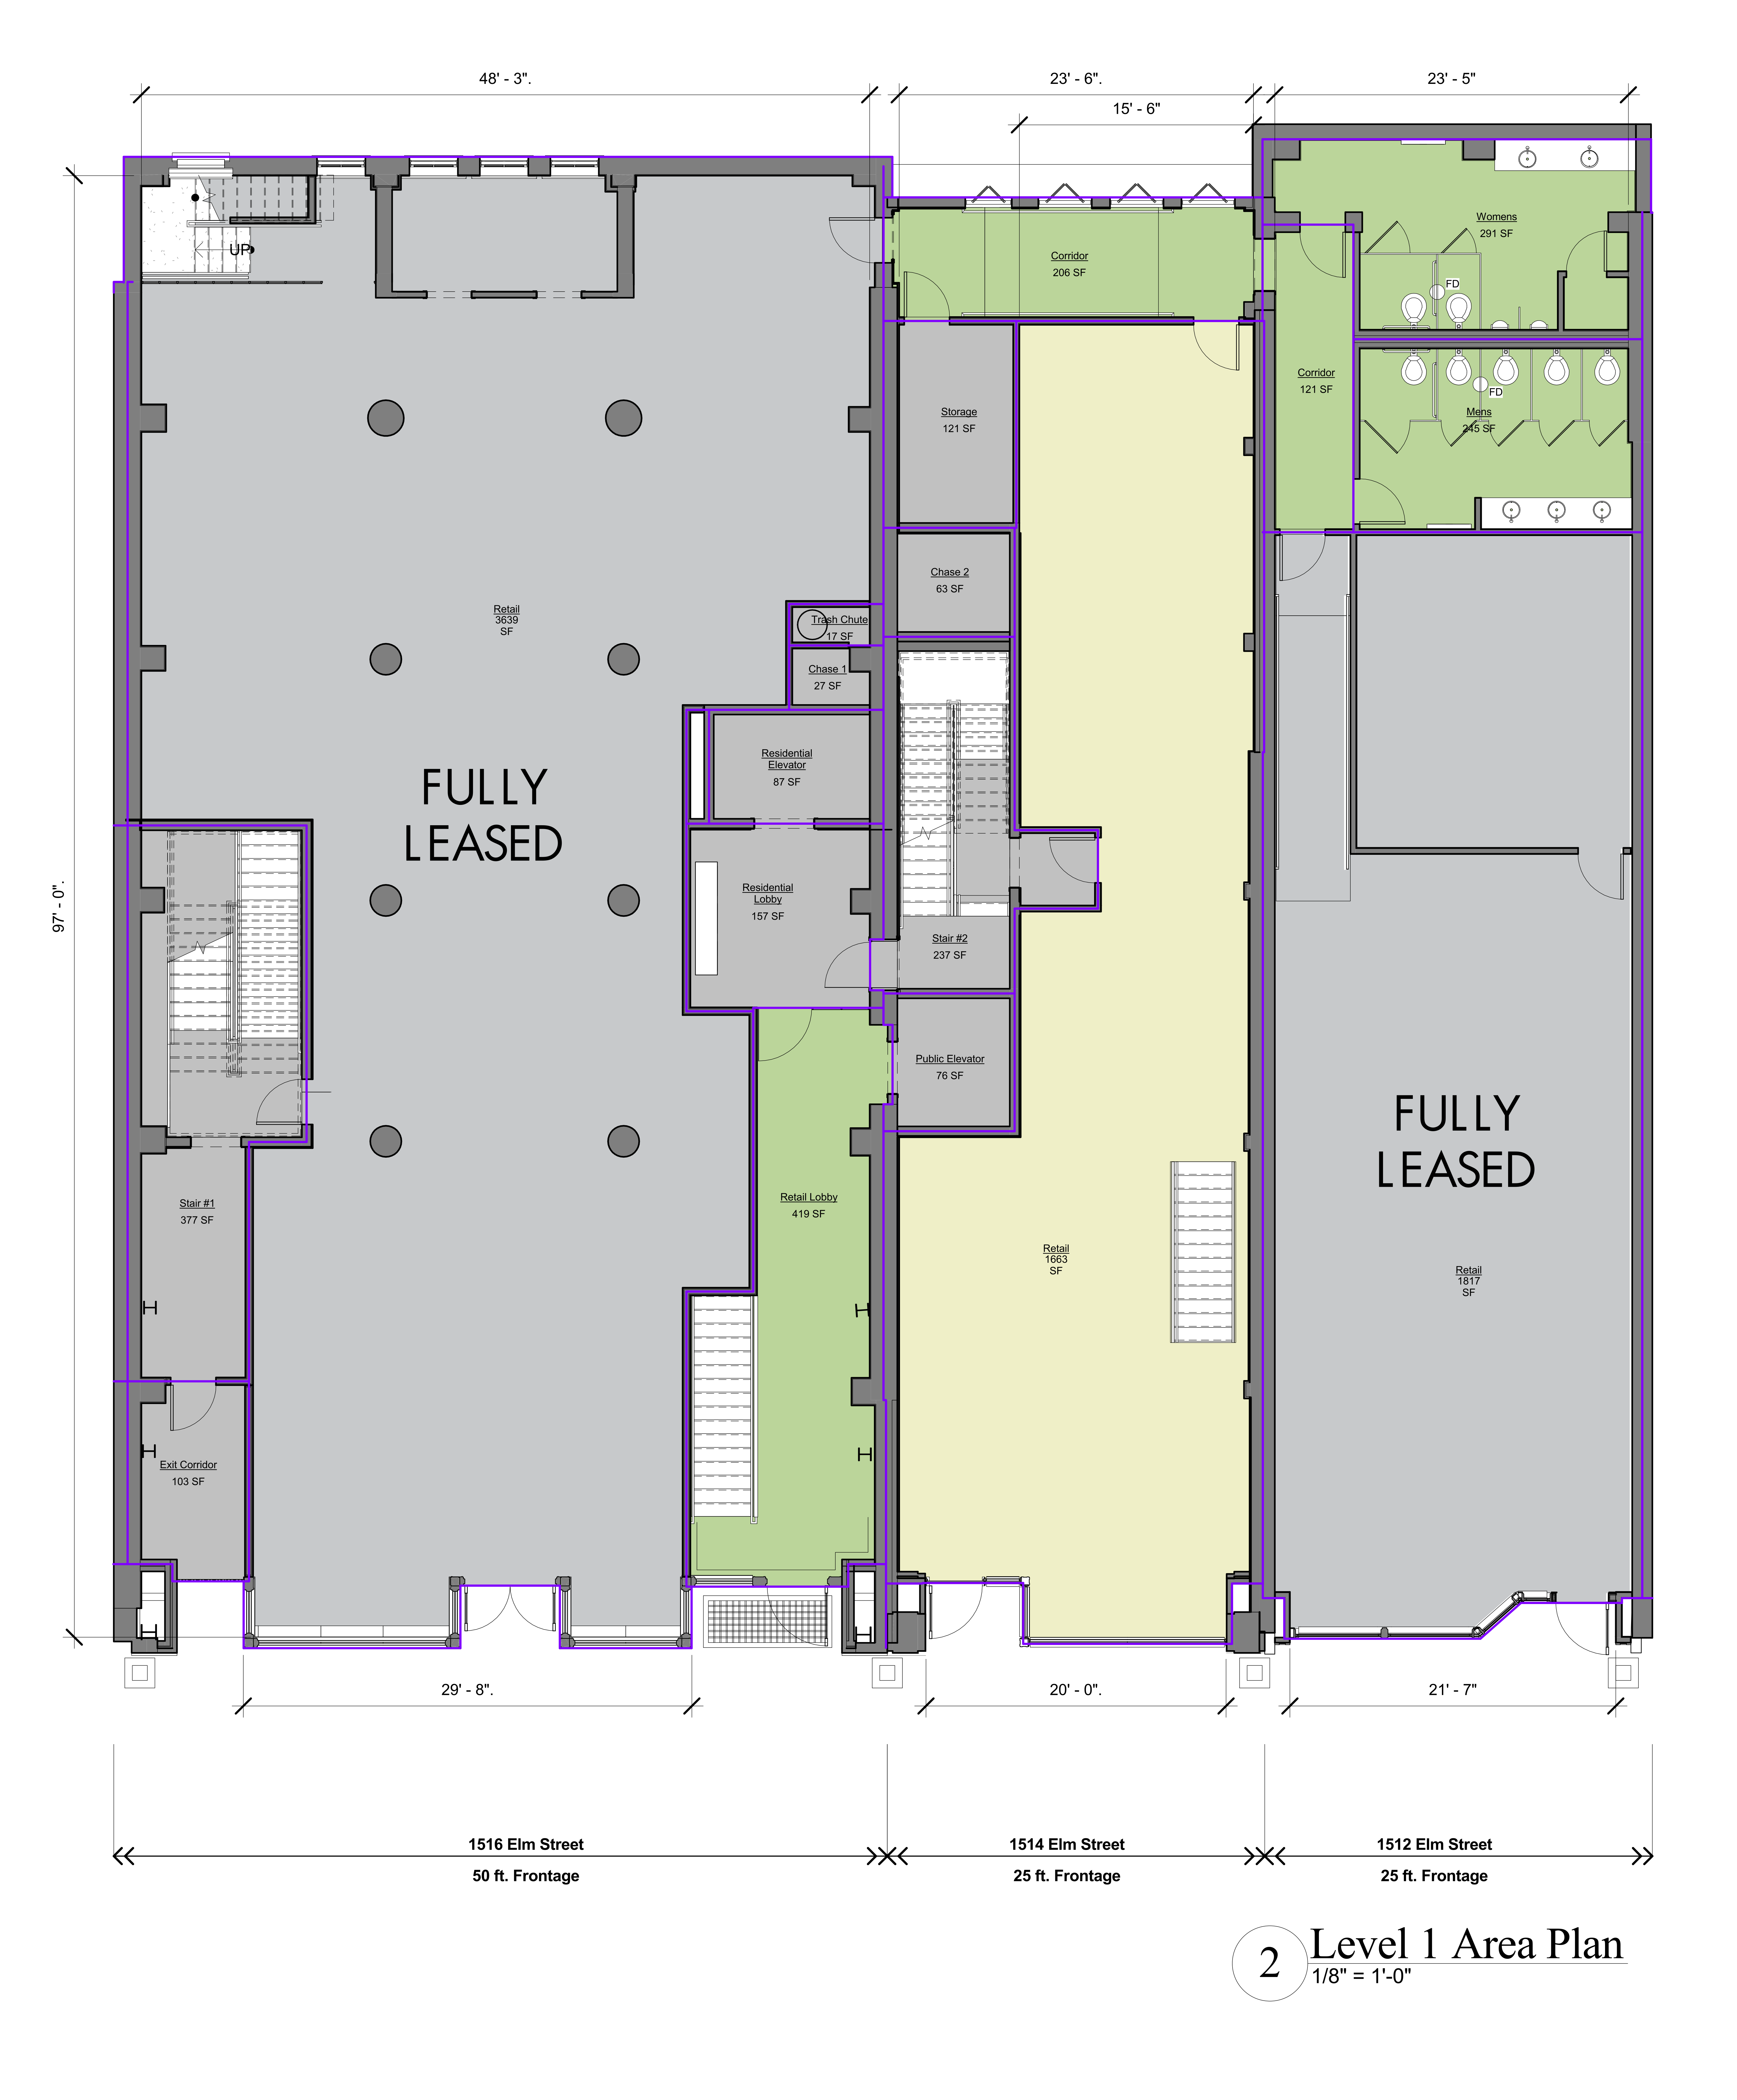 Mid Elm Lofts: site plan